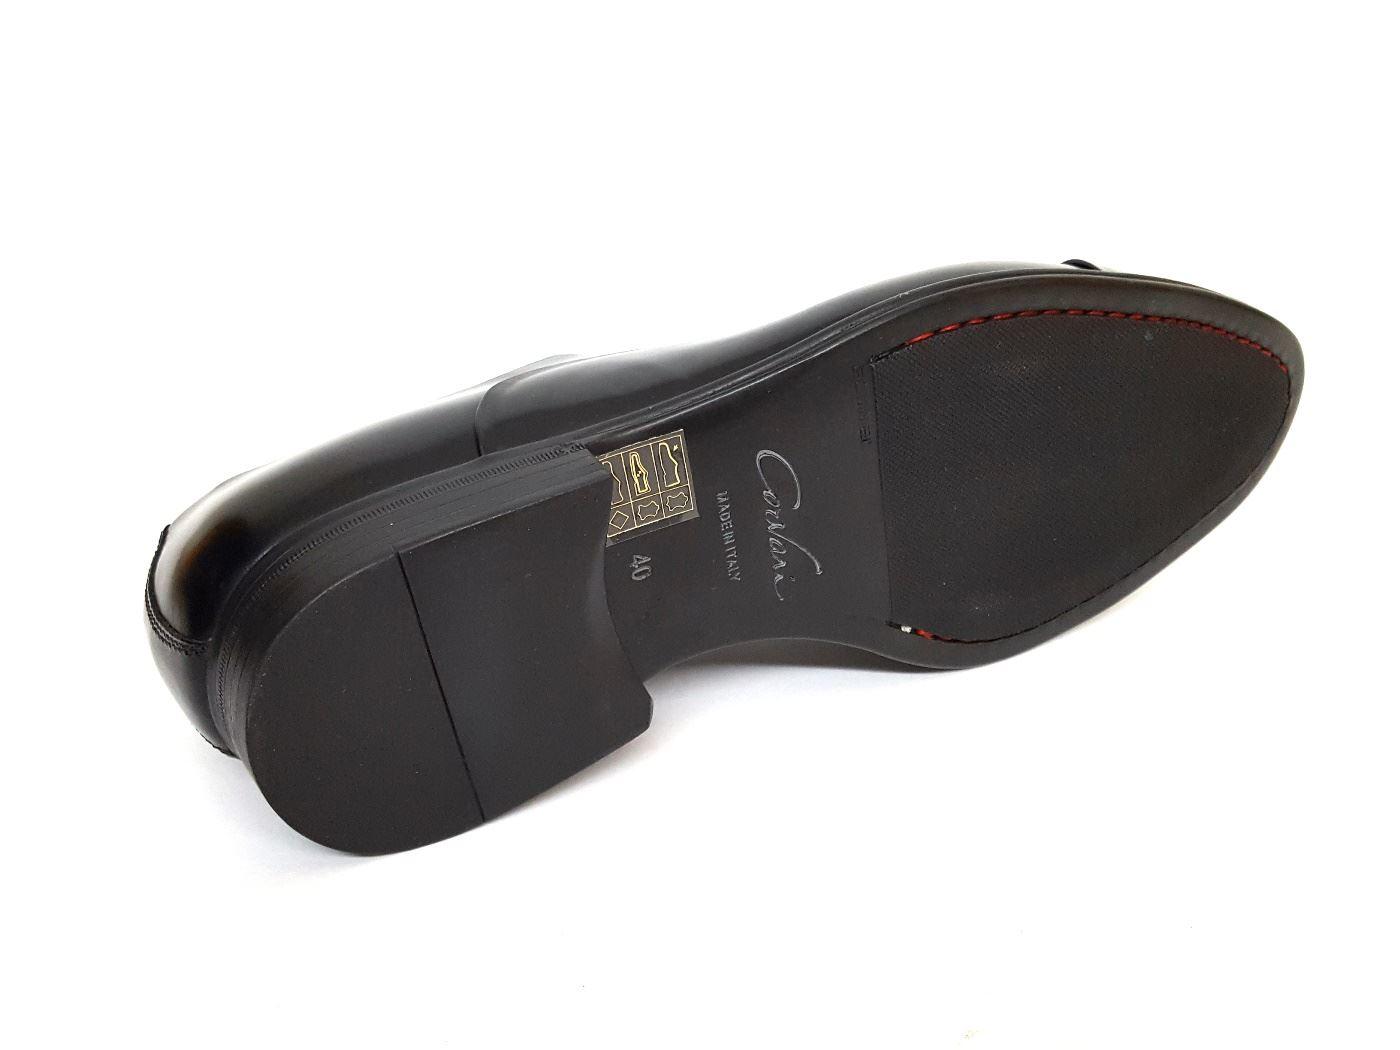 Pelle Ebay Dover Scarpa 3504 Nero Stringata In Mainapps Uomo Corvari qaxH06B